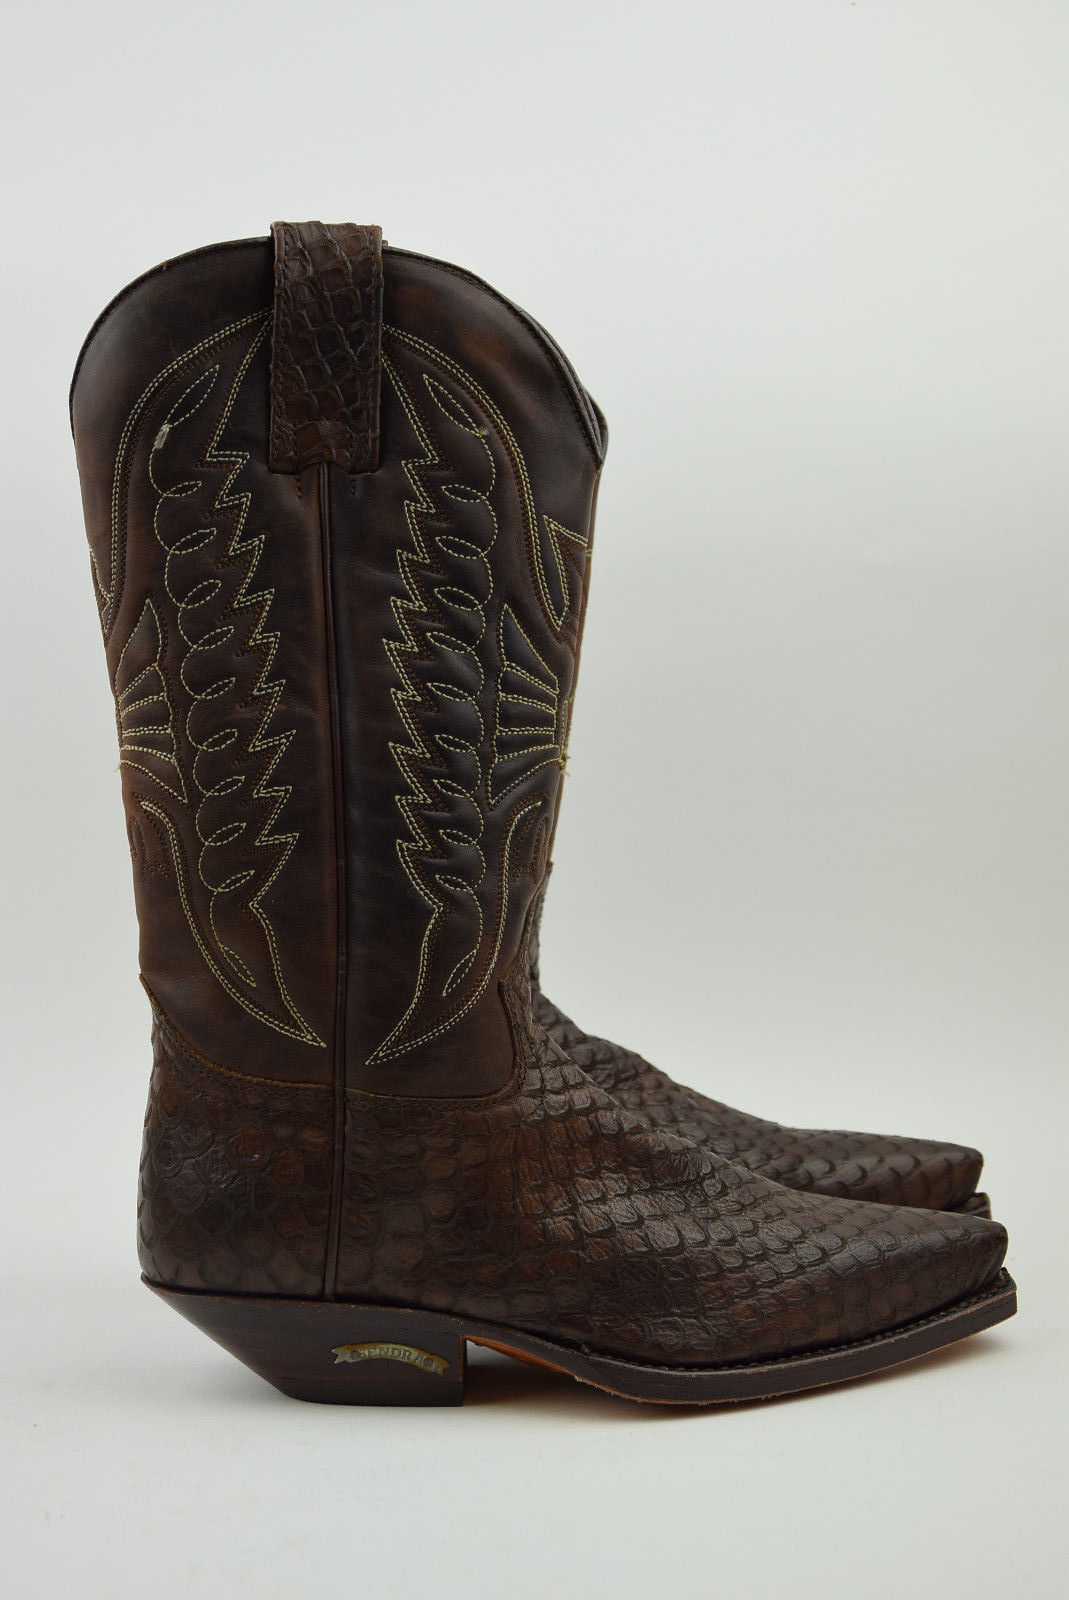 Sendra Style Western Cowboy bottes Marron Femme Taille 3.5